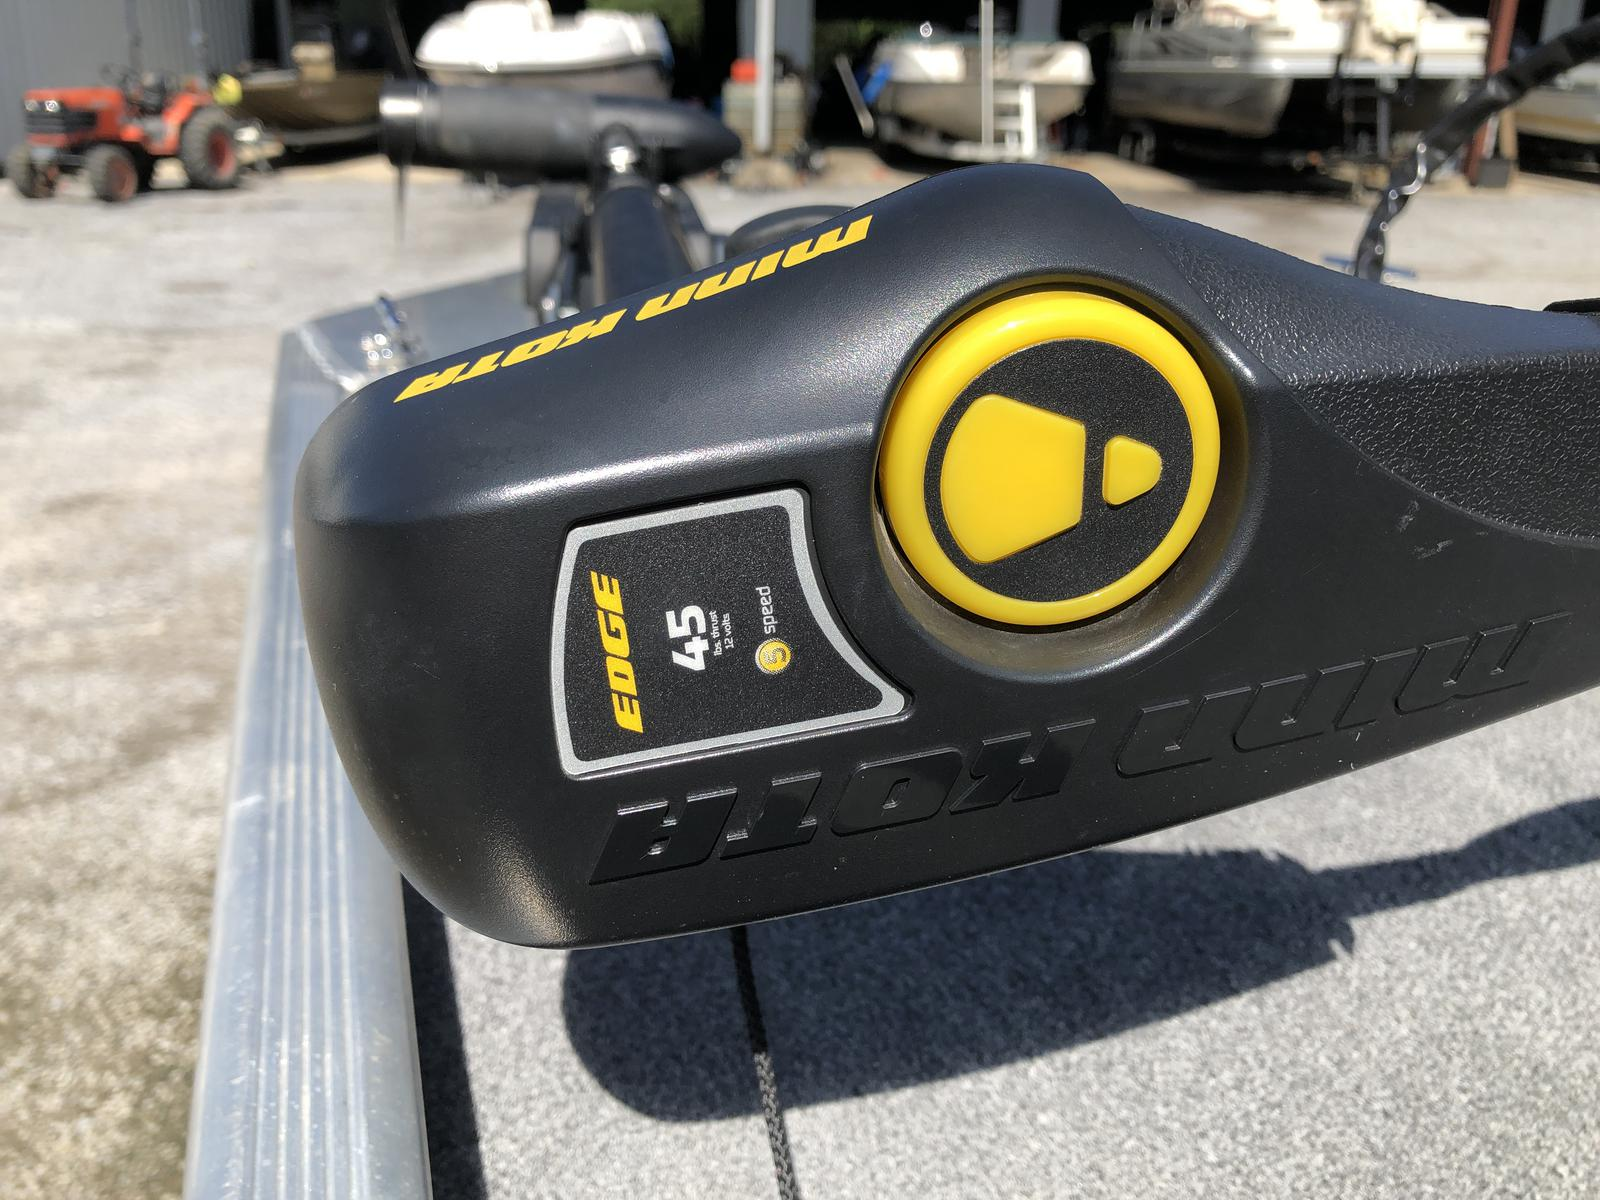 2016 Tracker Pro 160